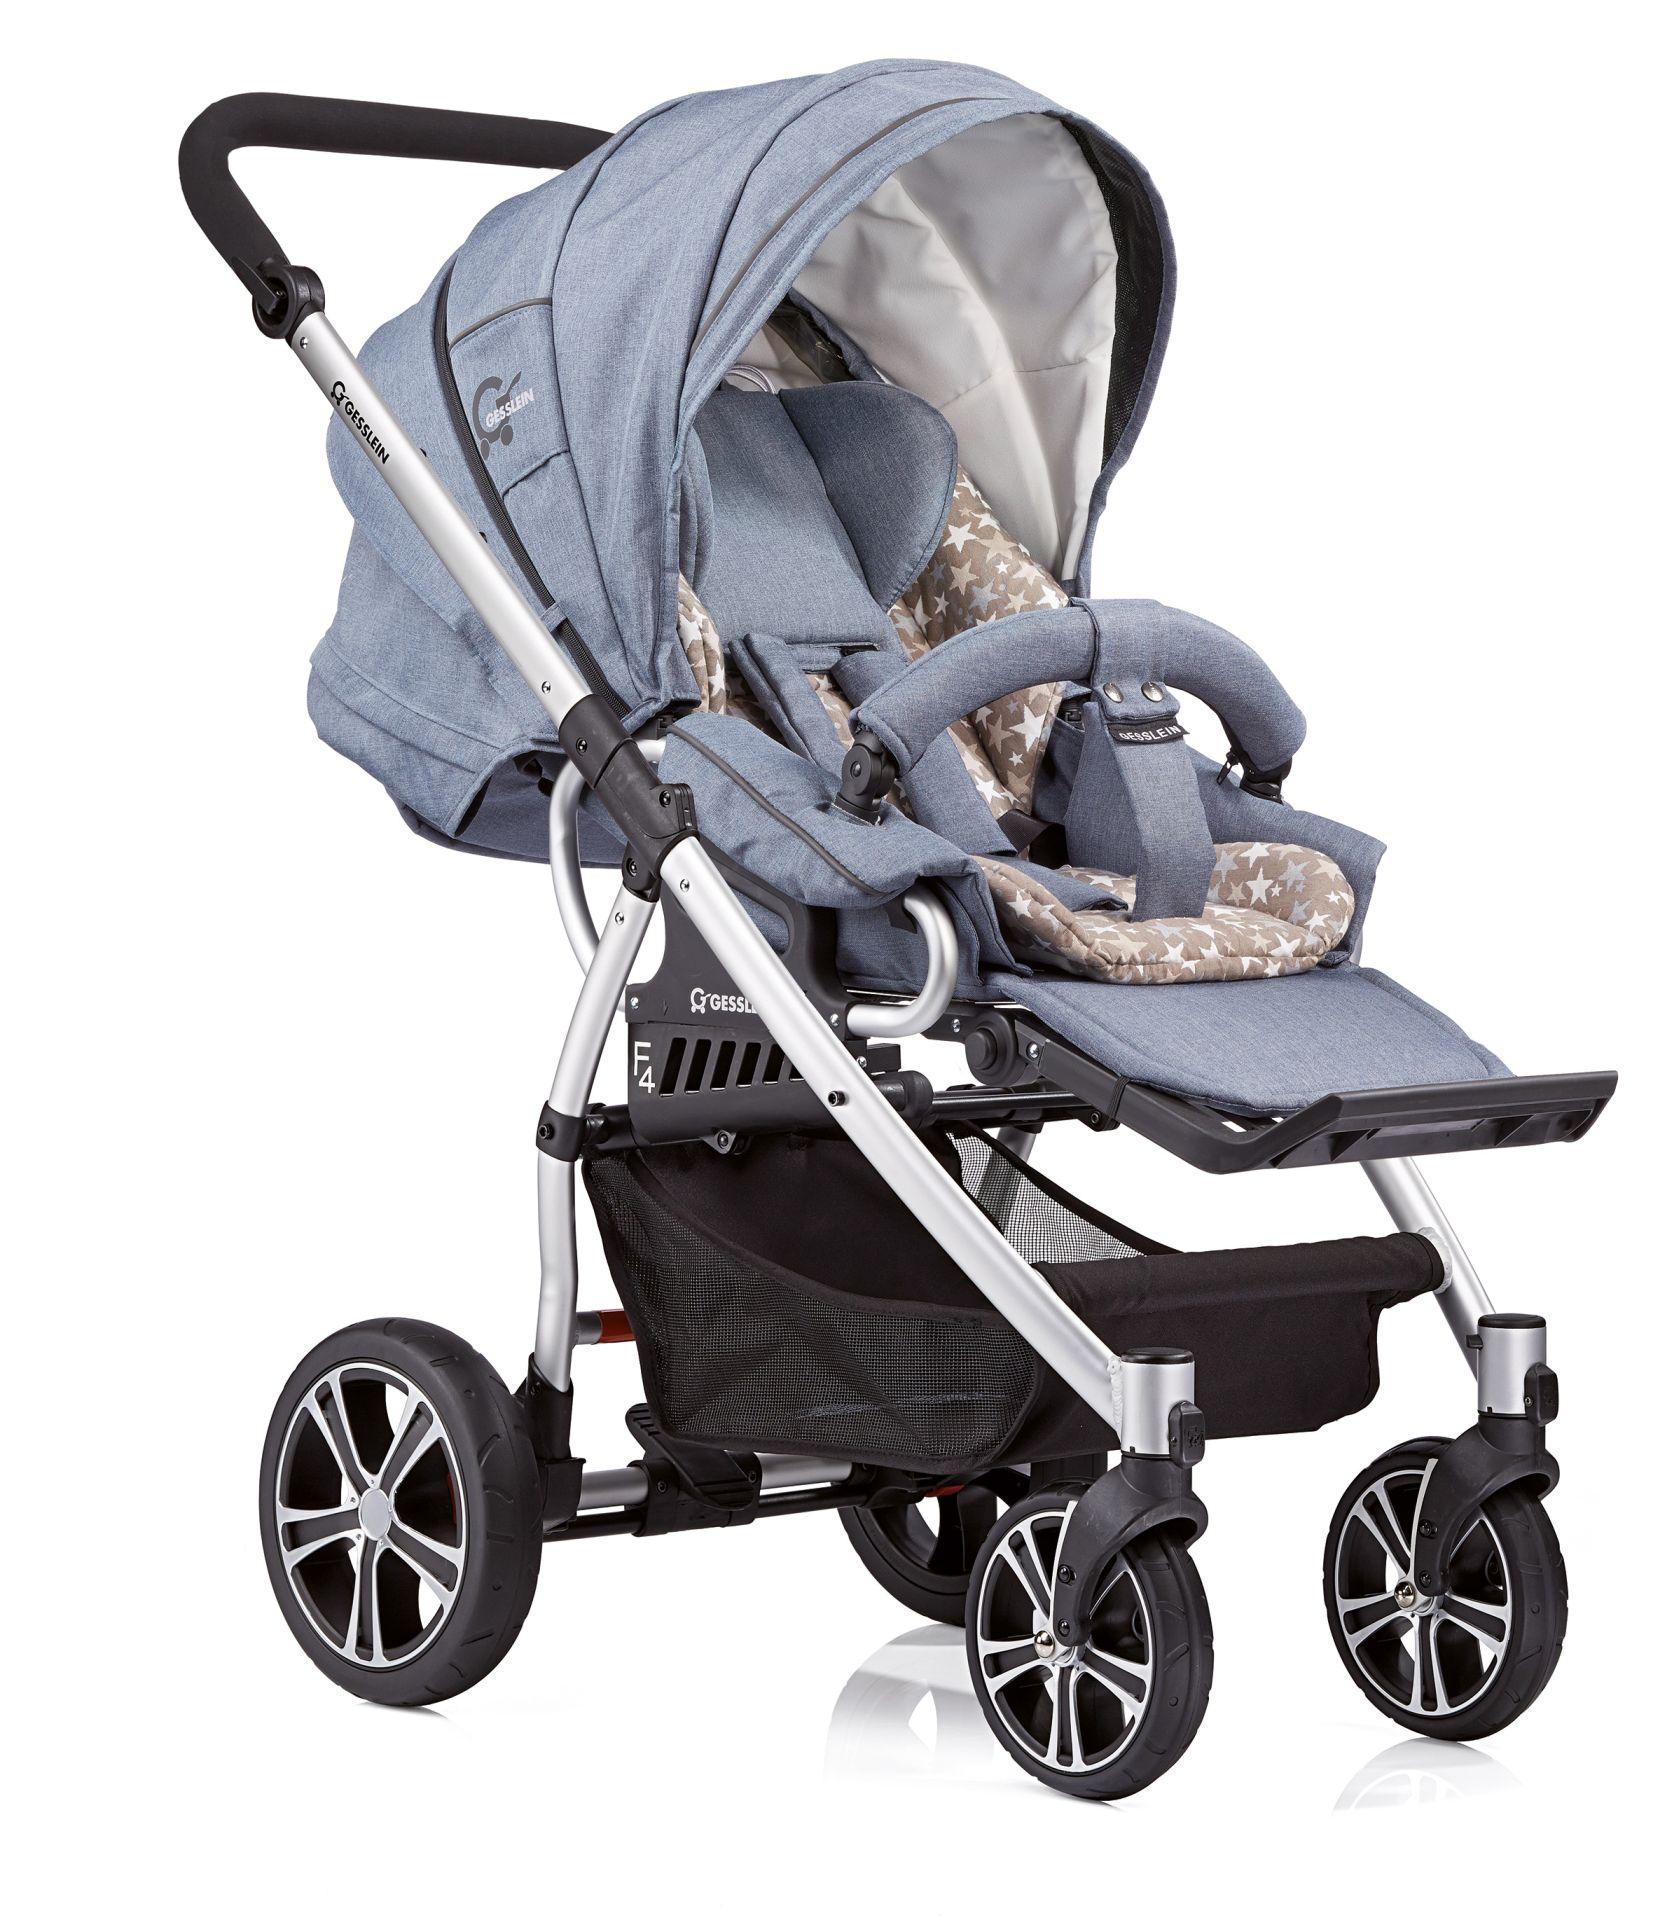 gesslein stroller f4 air 2017 763763 buy at kidsroom strollers. Black Bedroom Furniture Sets. Home Design Ideas